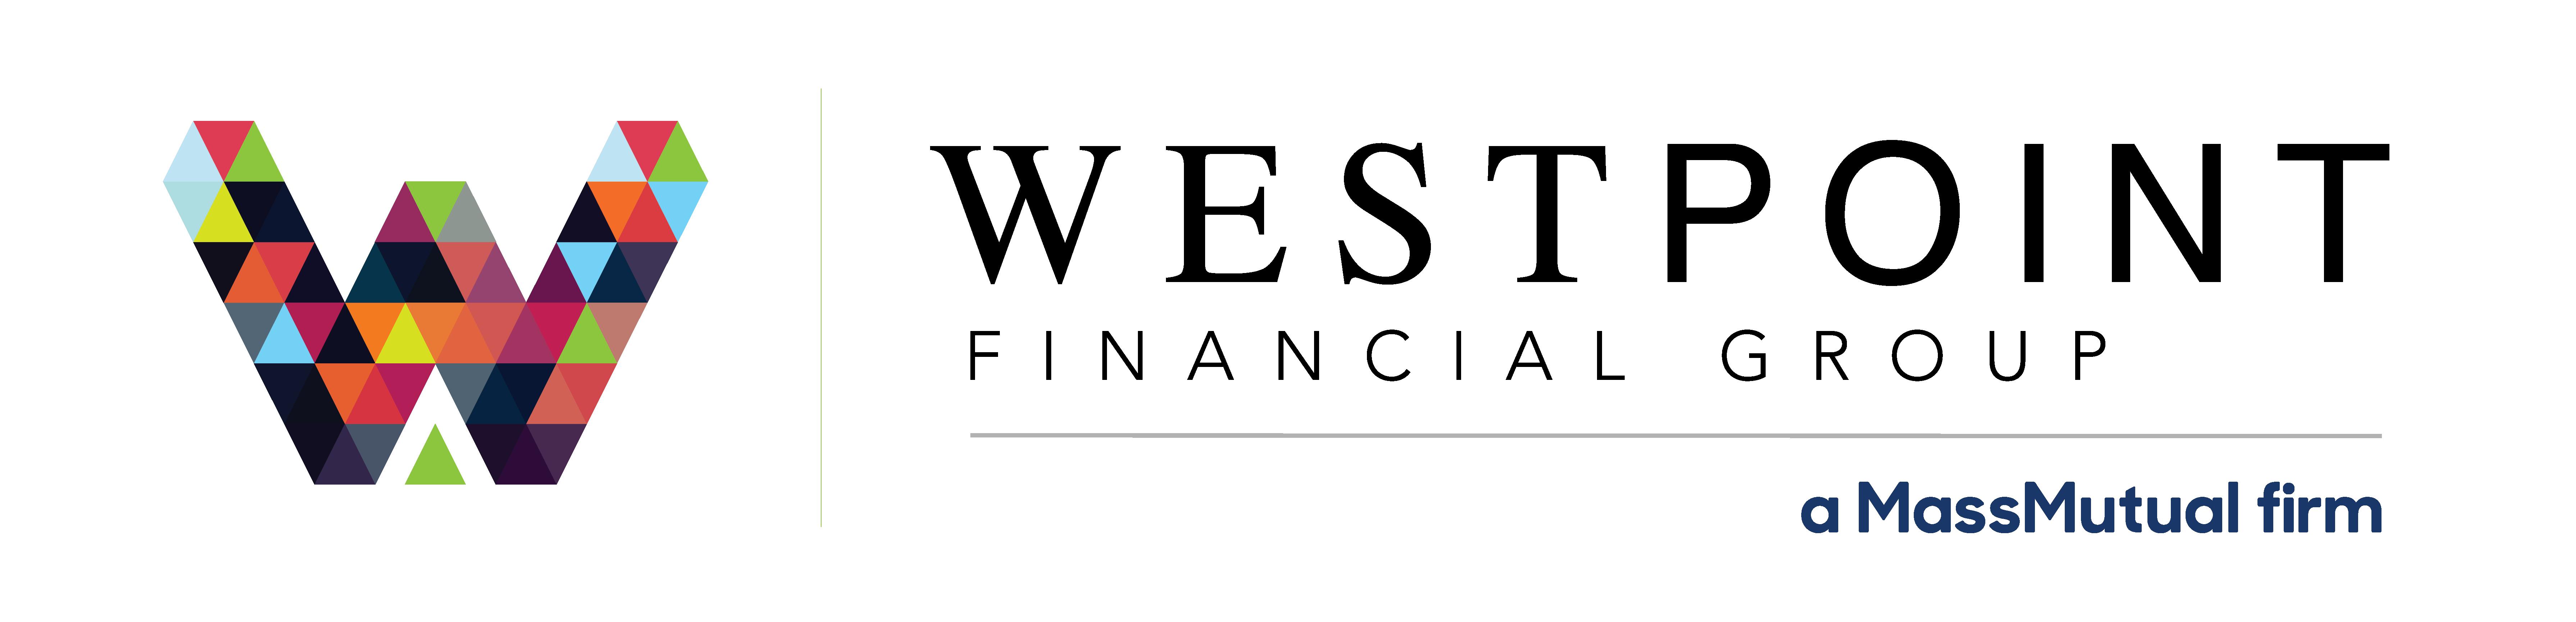 WestPoint Financial Group logo